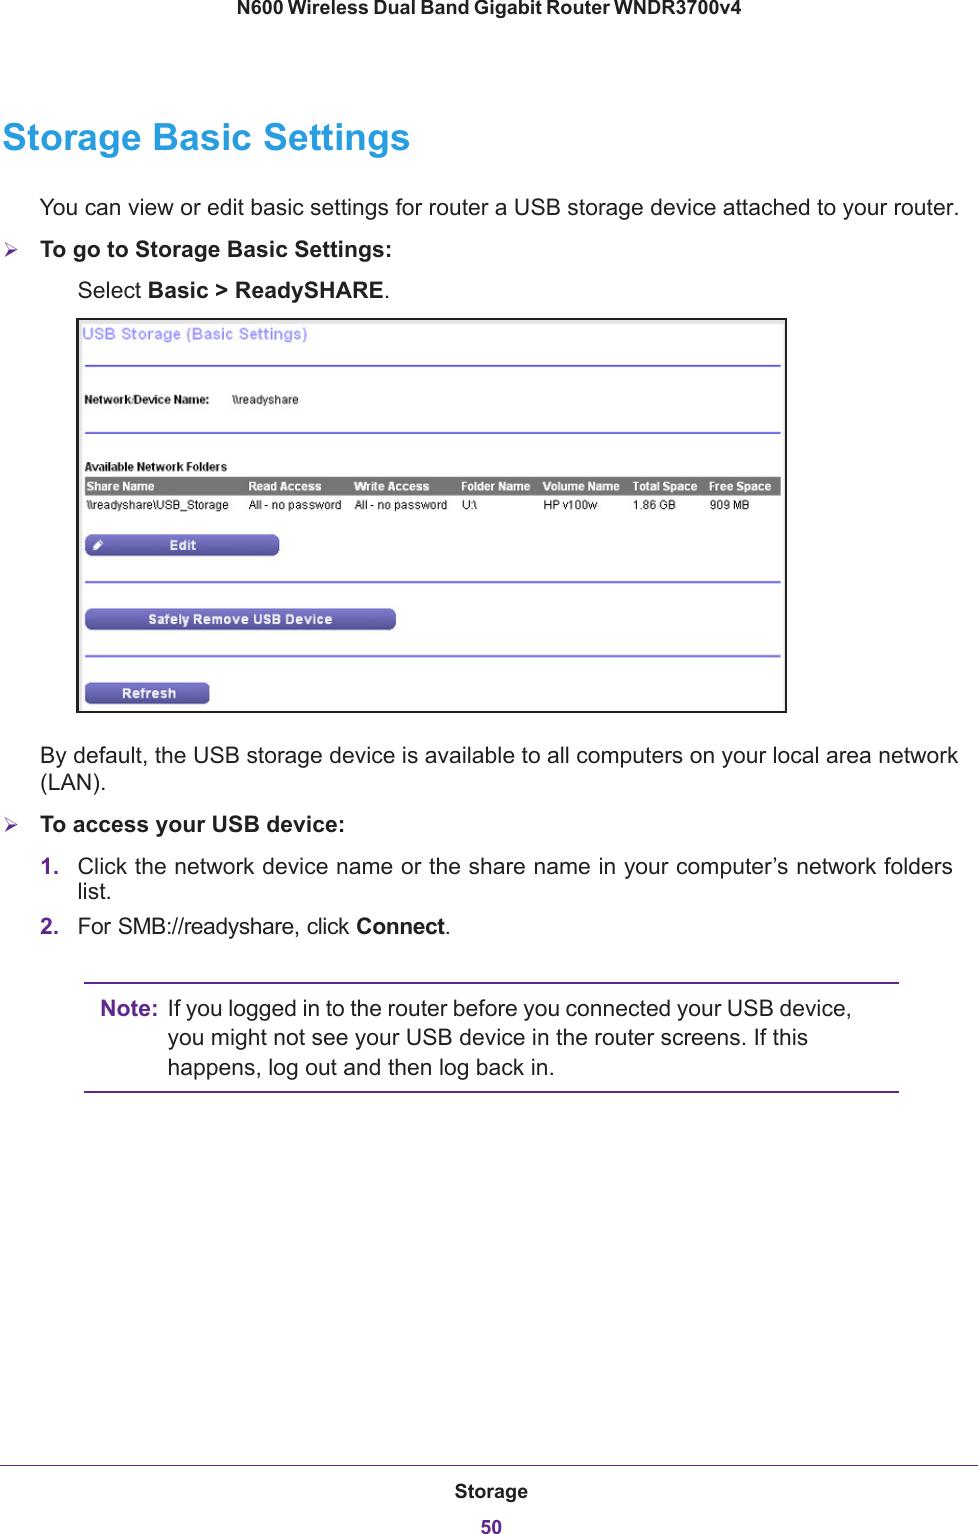 Netgear Wndr3700V4 Owner S Manual N600 Wireless Dual Band